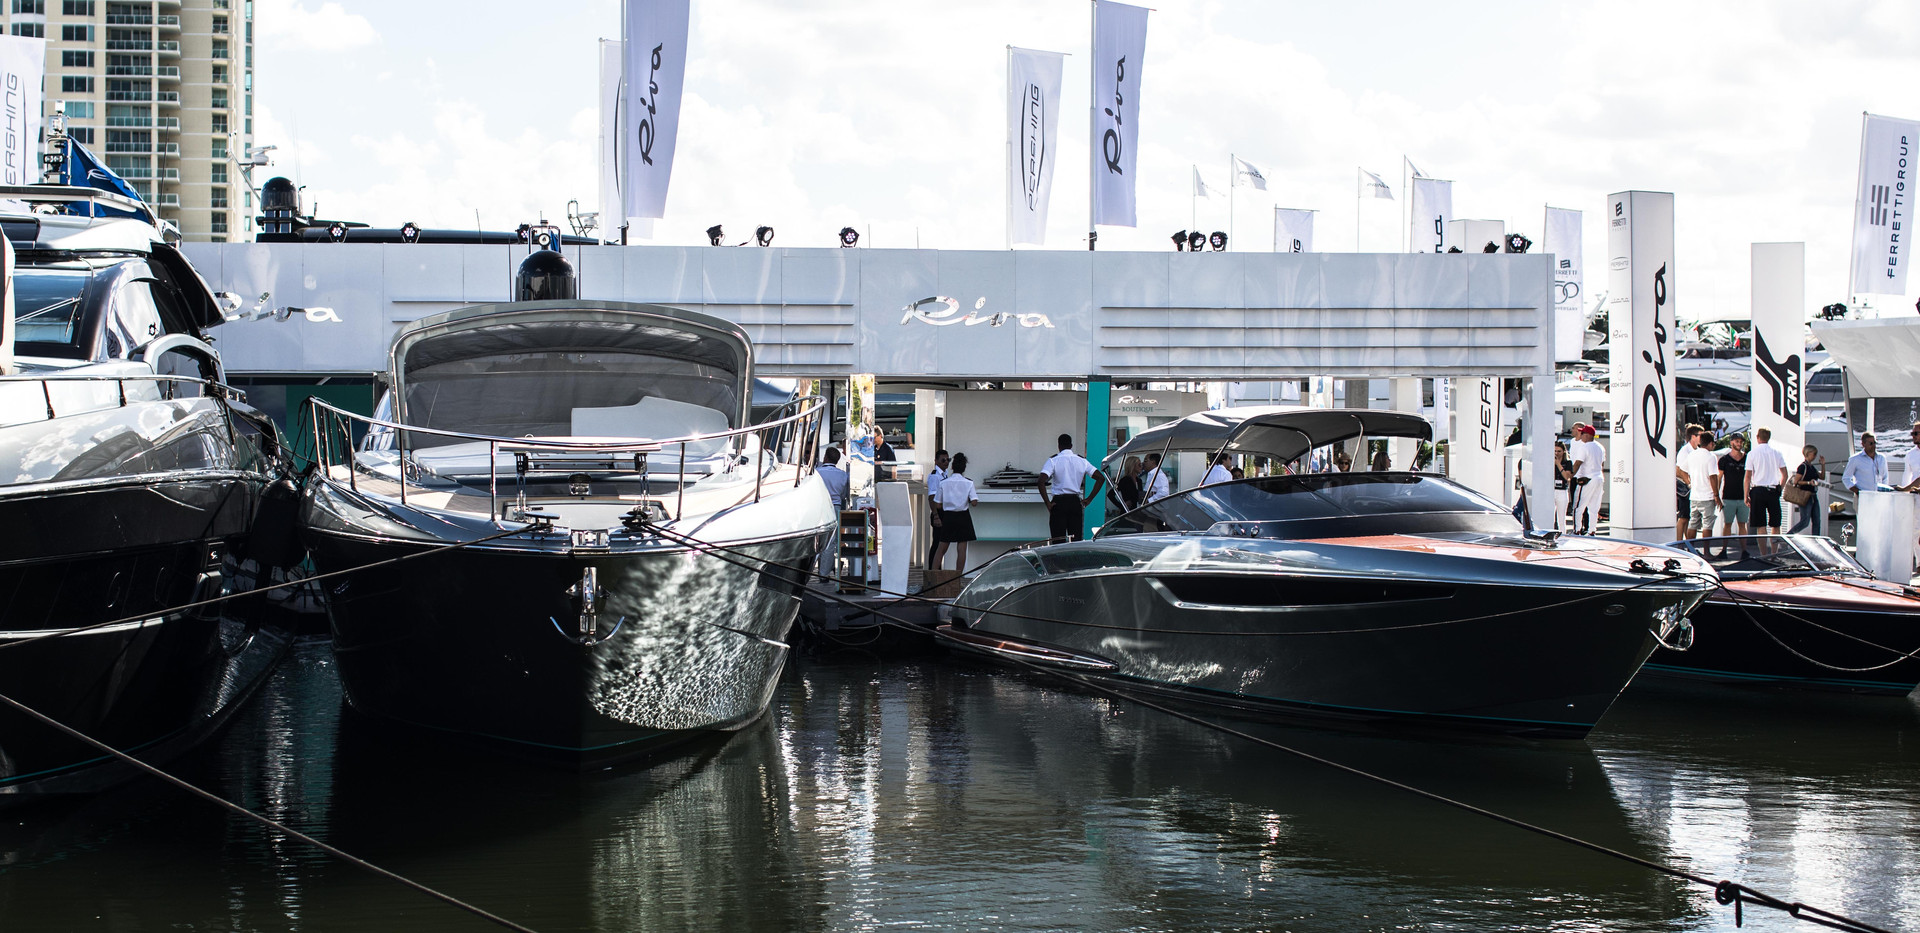 BoatShow-25.jpg